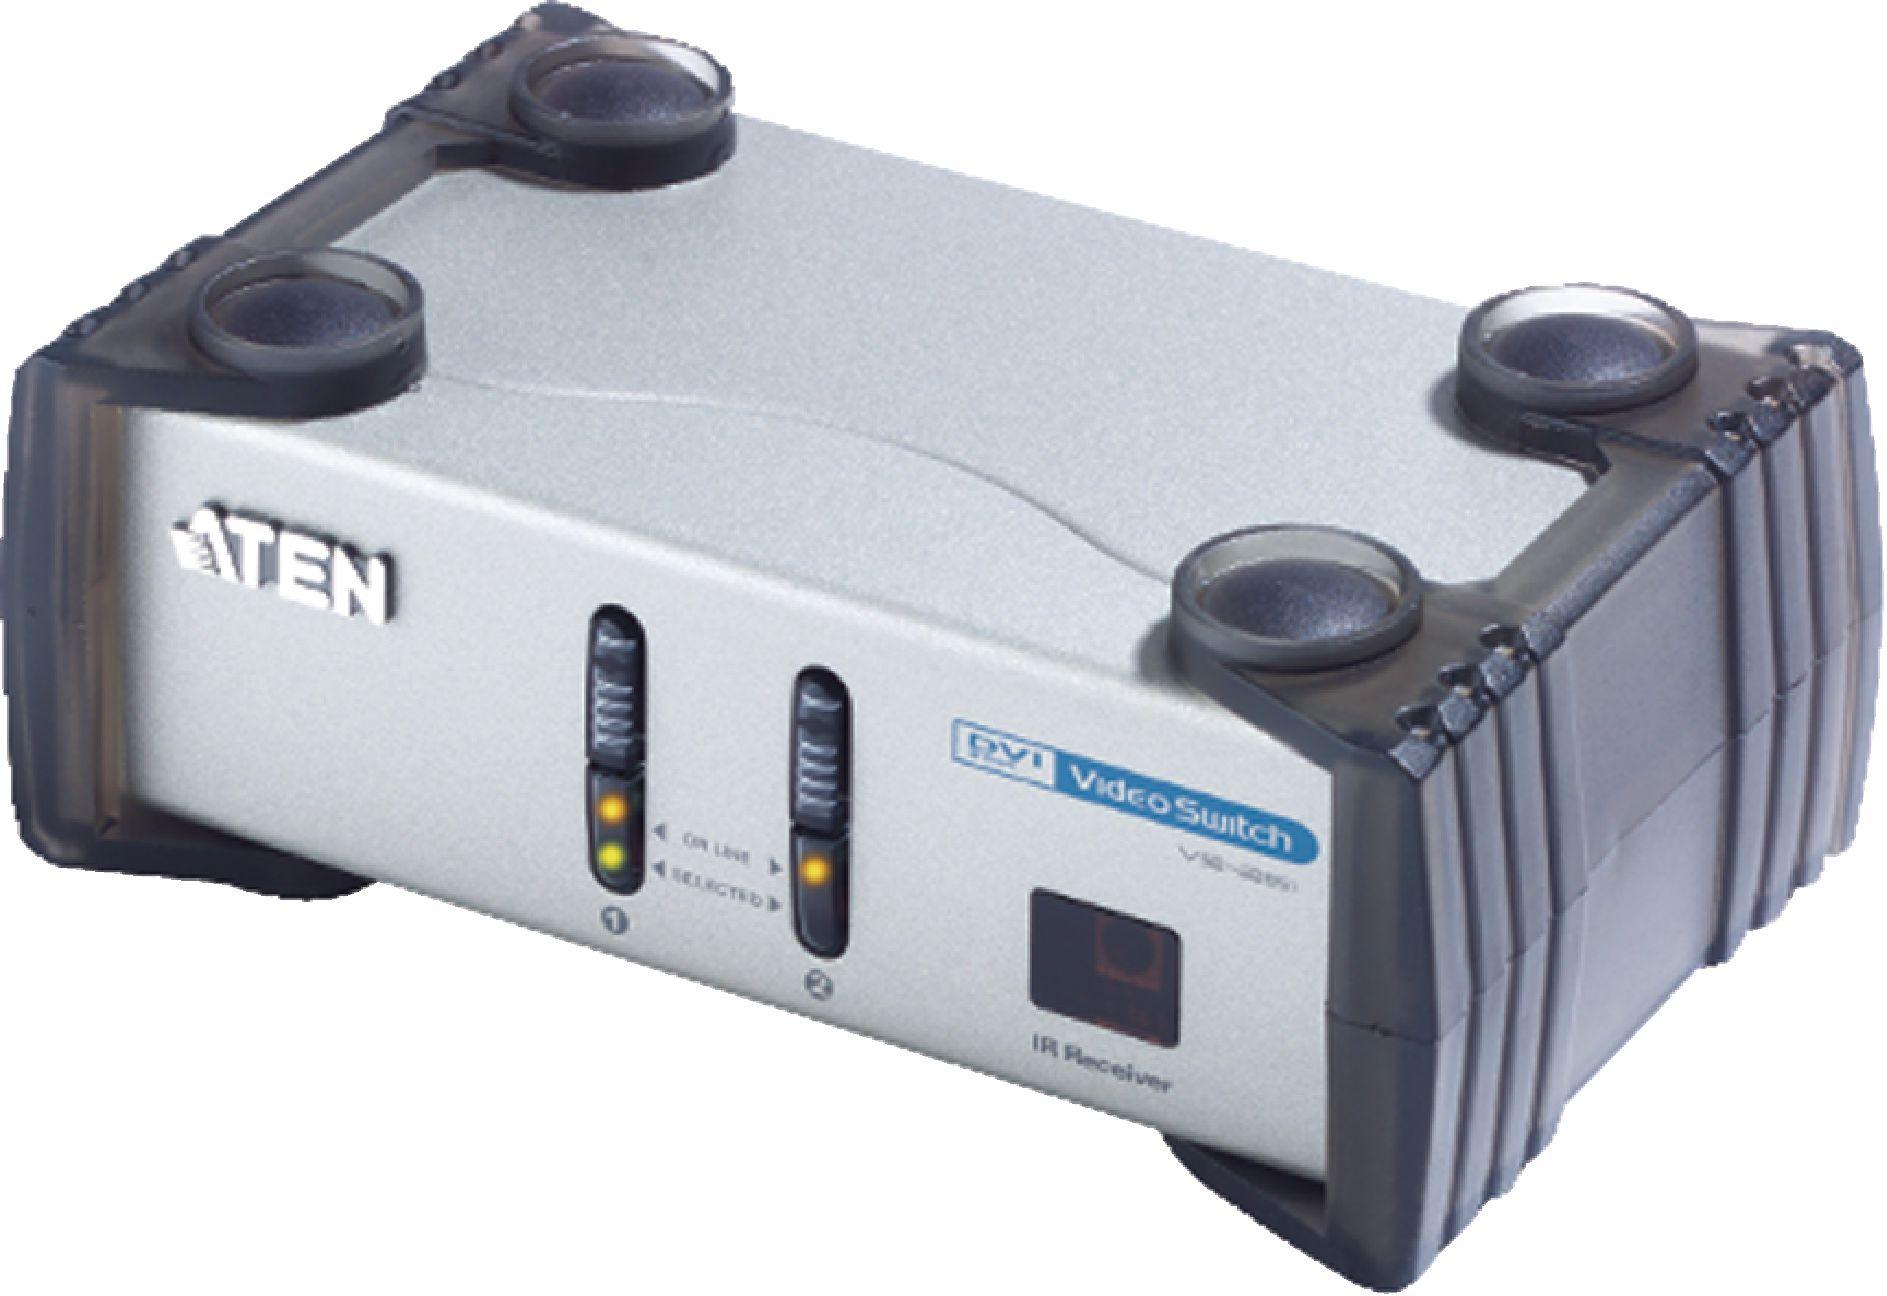 ATEN Video switch DVI-I, 2-port